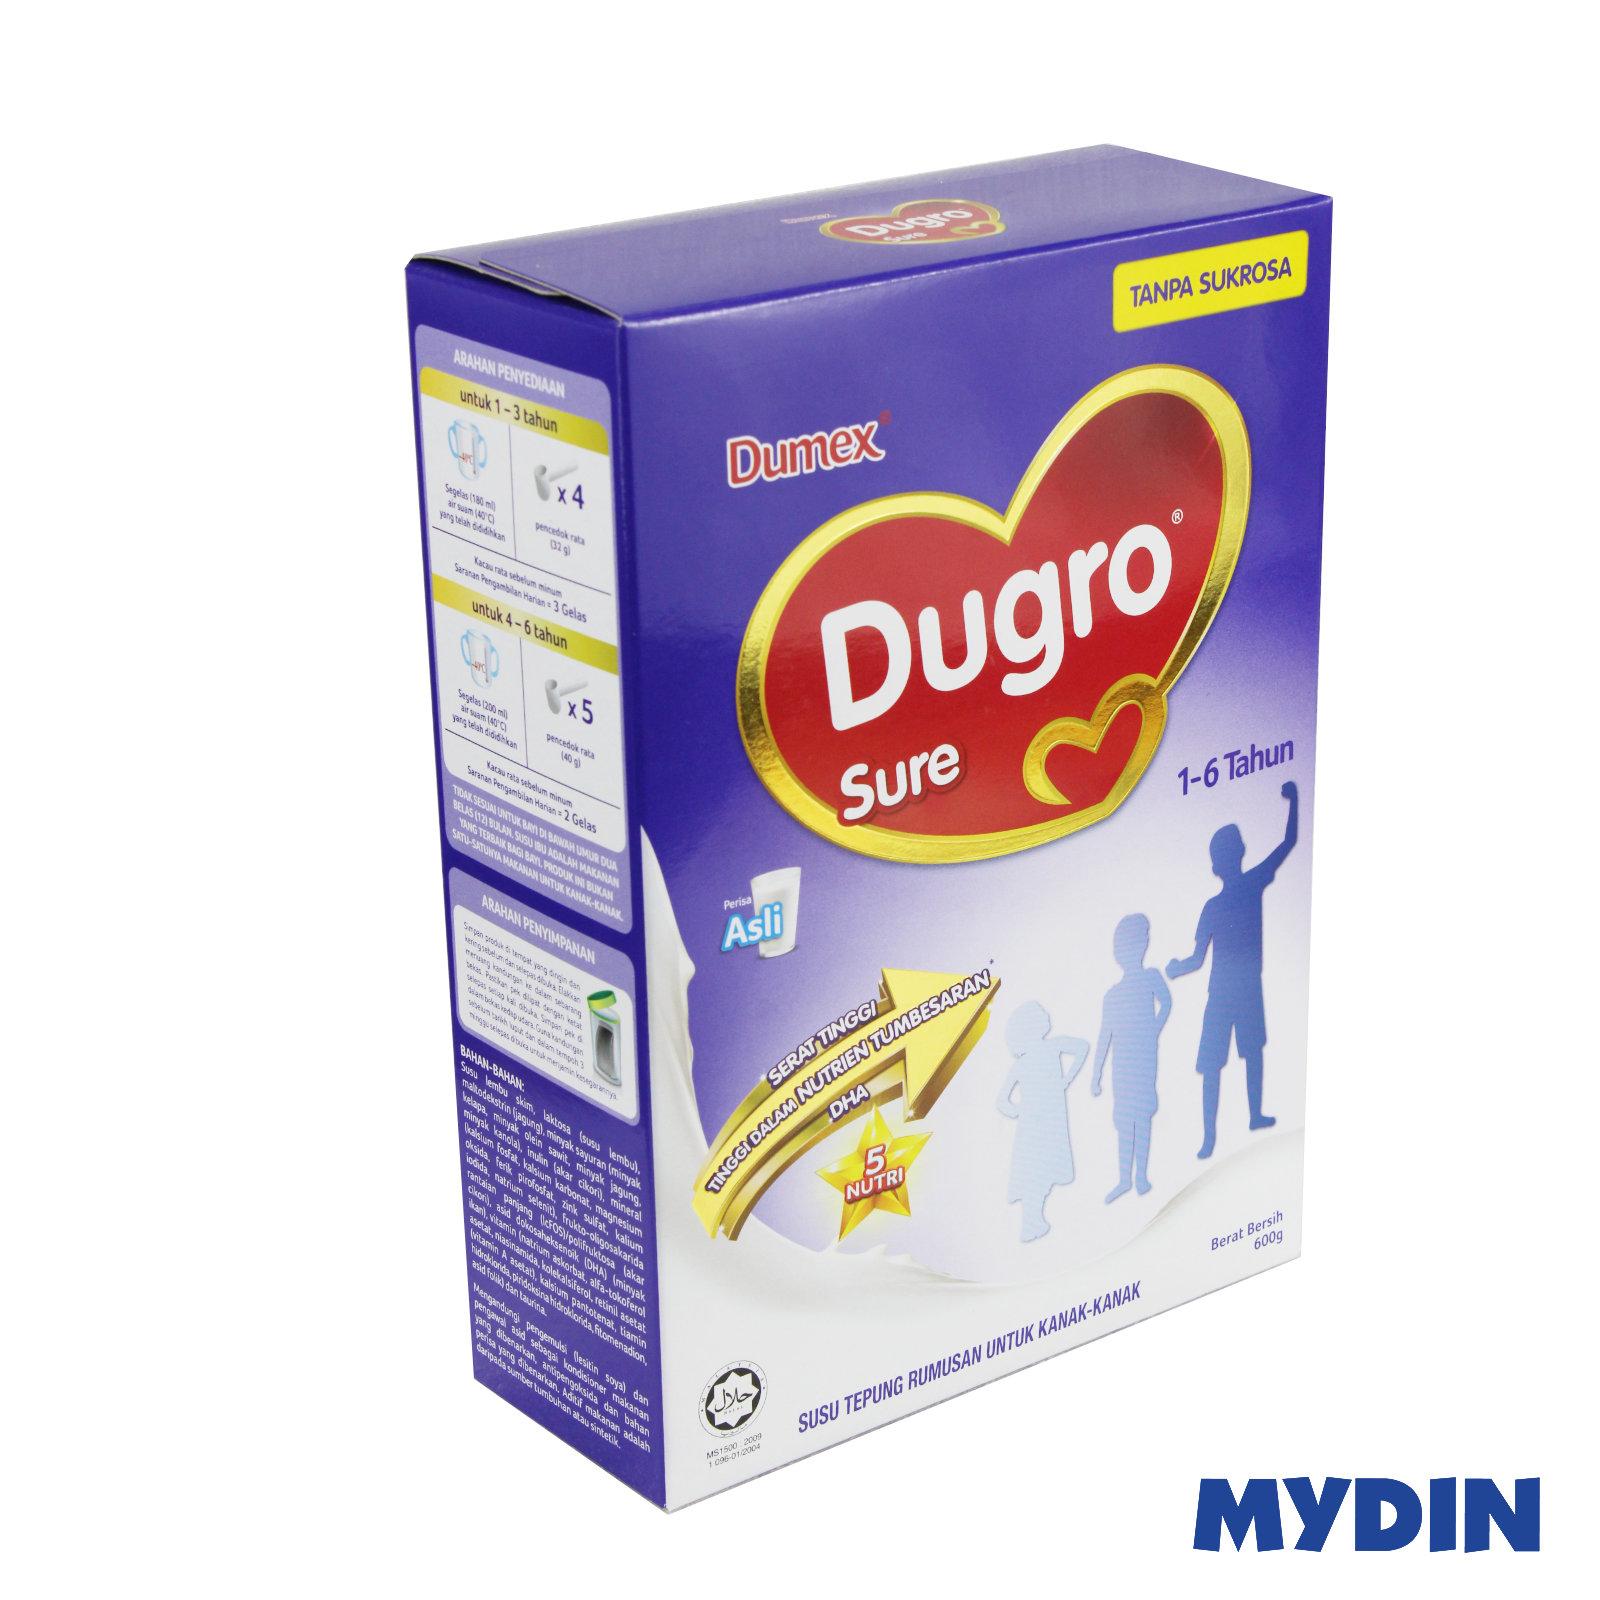 Dugro Sure Milk Powder (600g) - 2 Variants